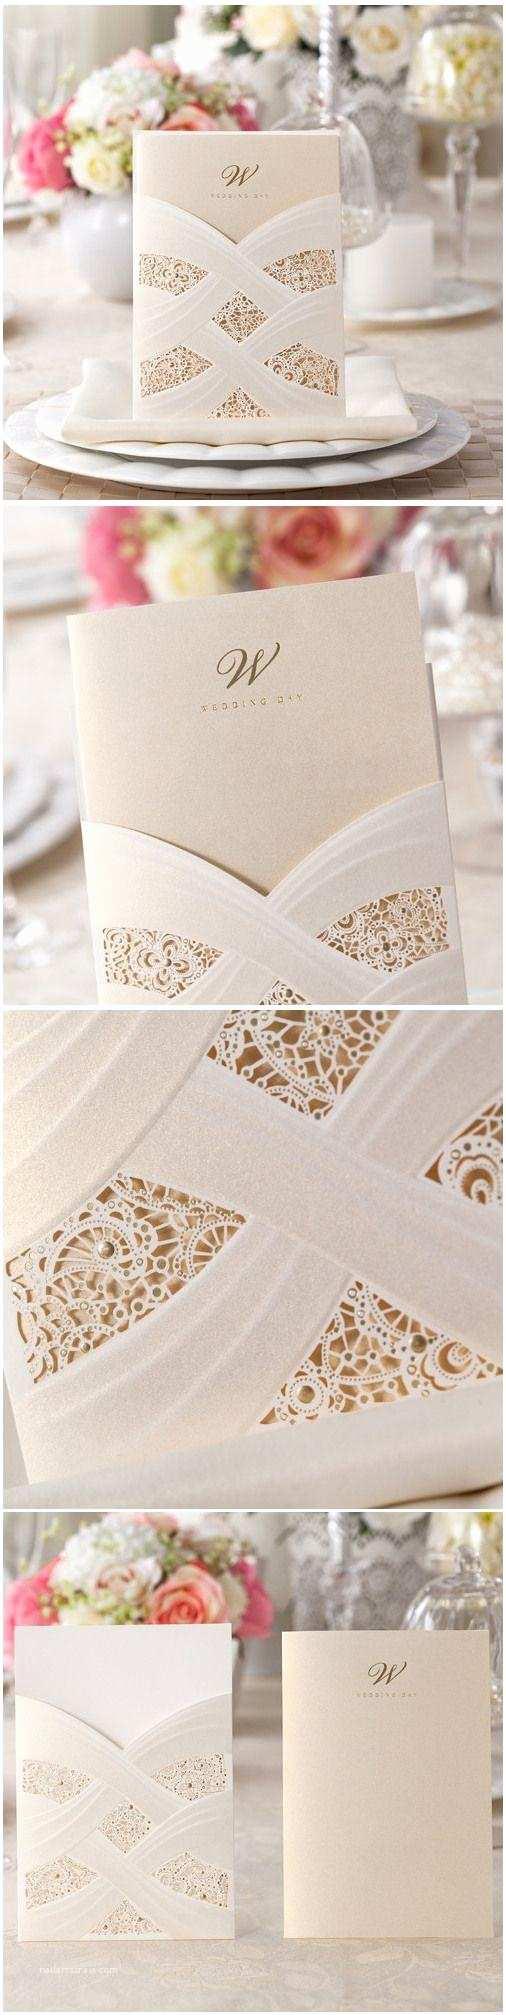 Ivory Pocketfold Wedding Invitations Elegant Foil Stamped Laser Cut Ivory Pocket Wedding